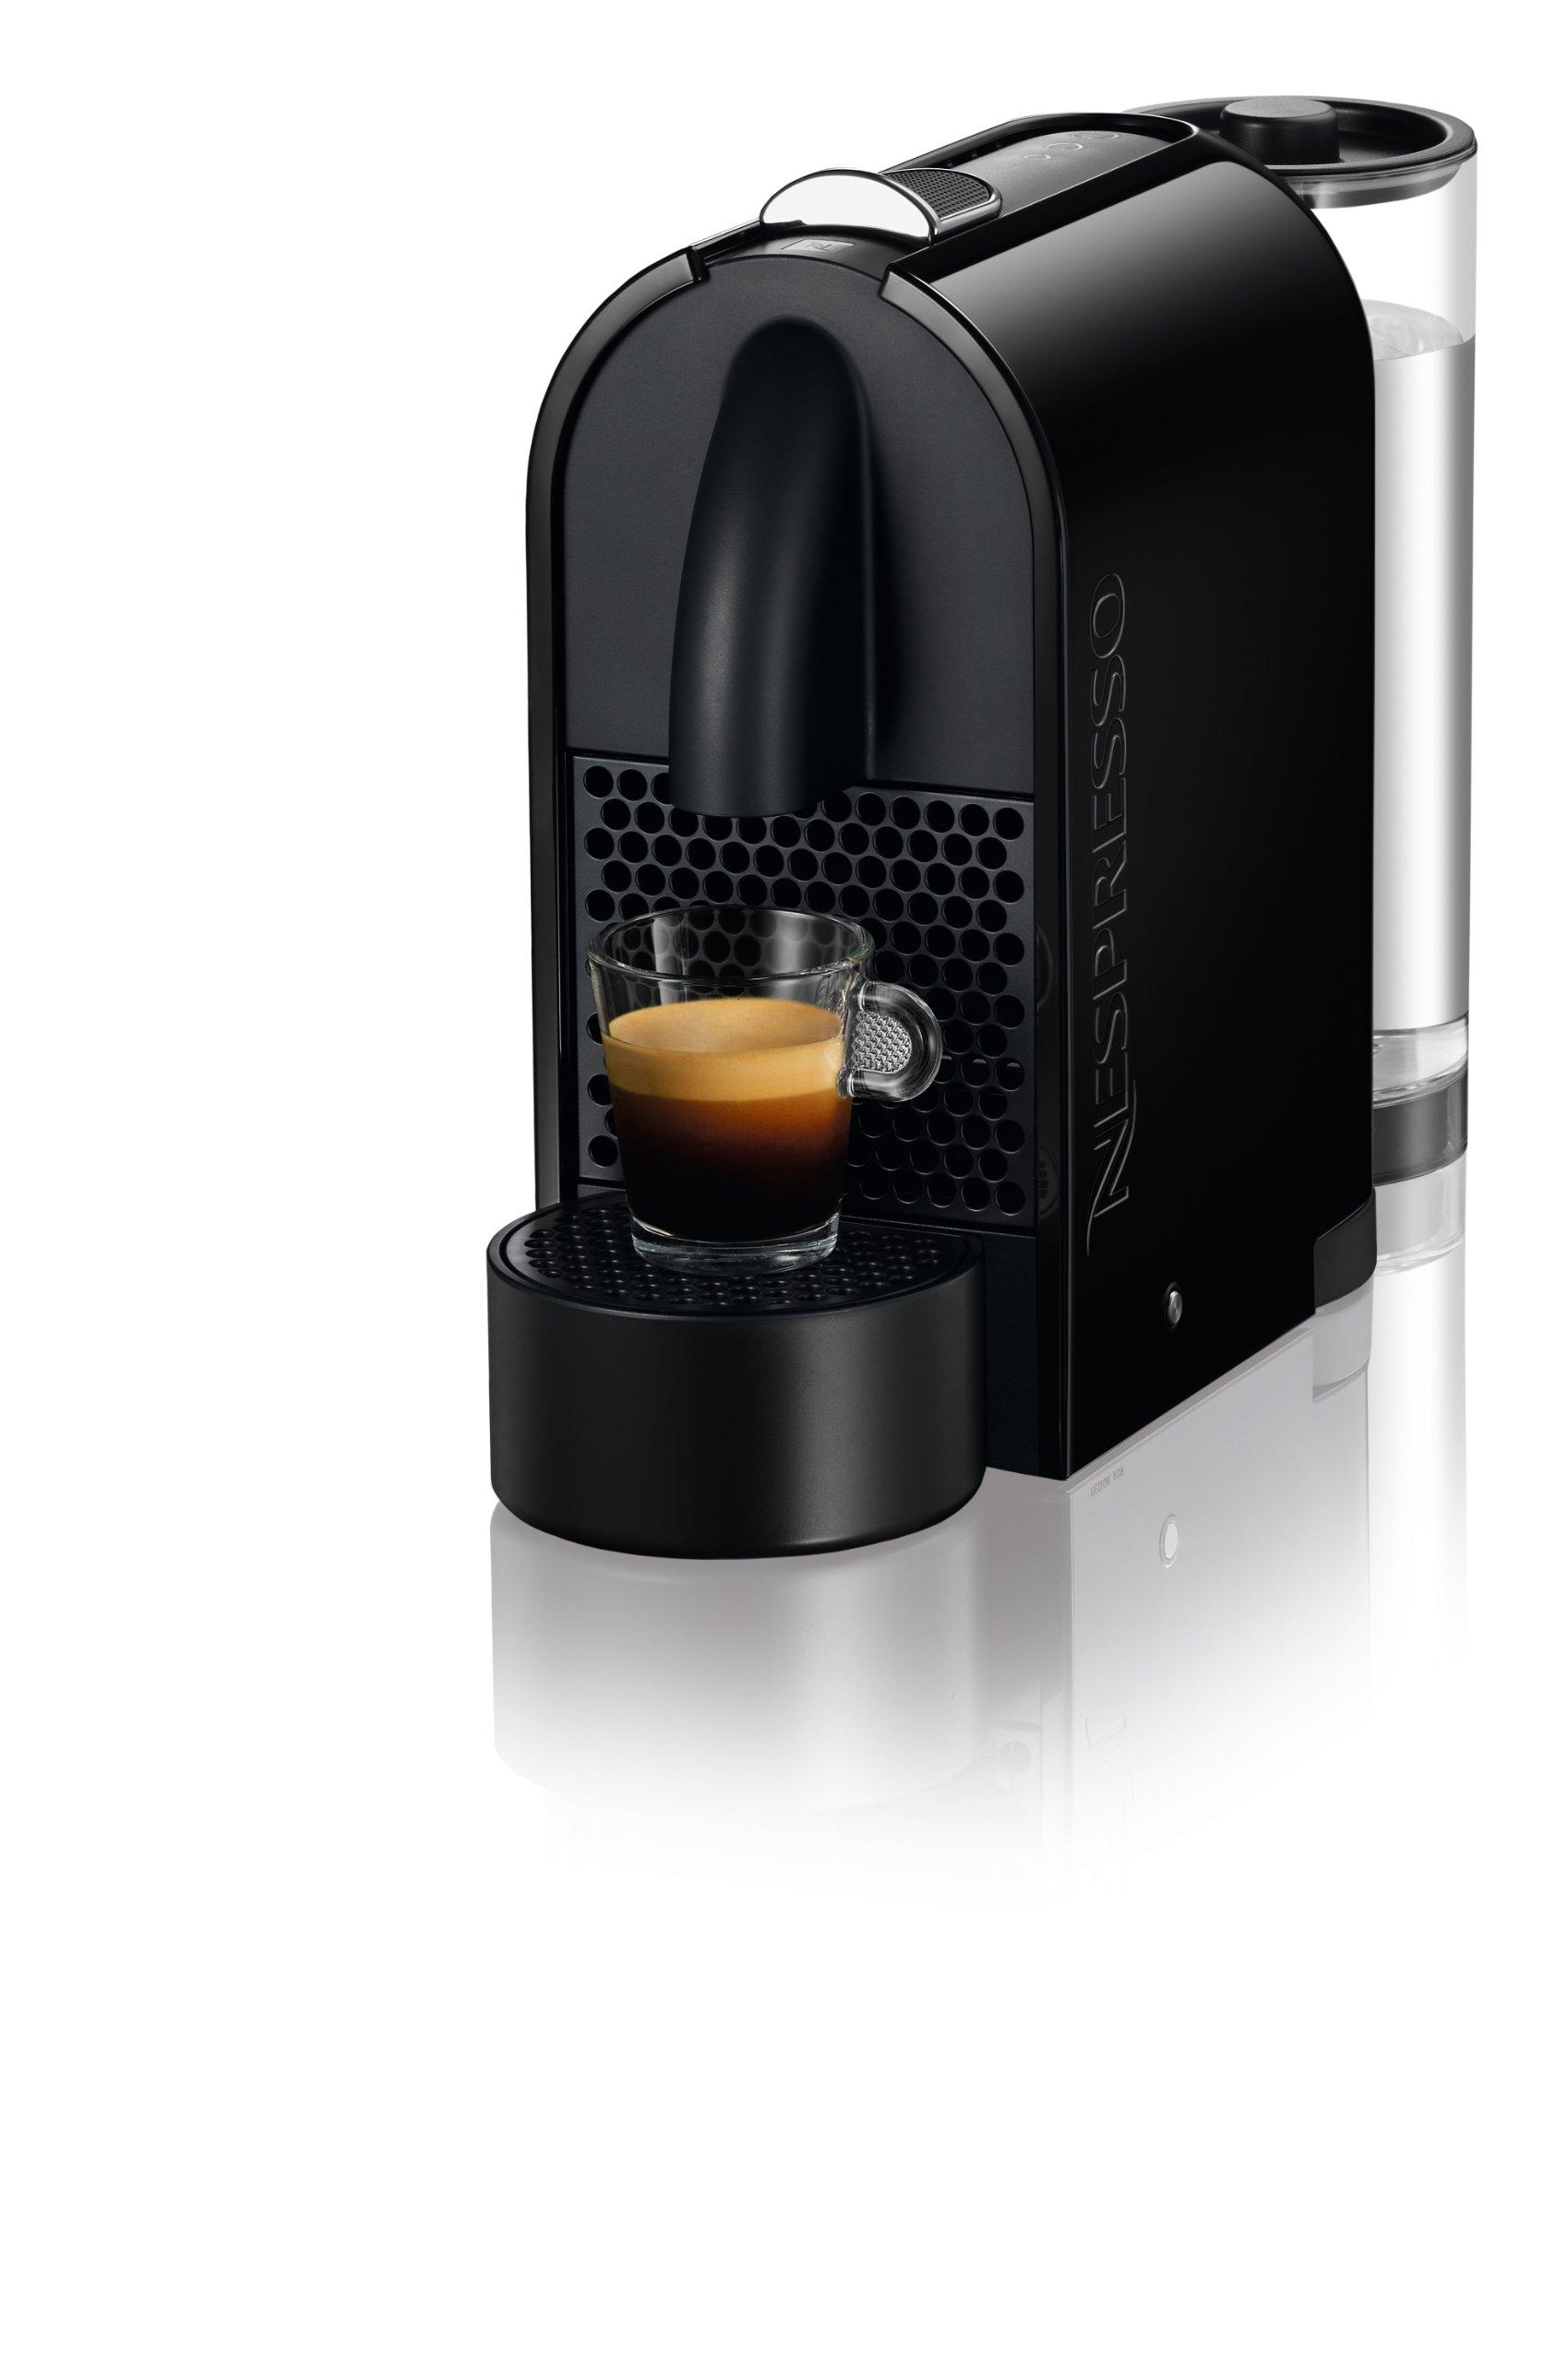 Nespresso U D50 Espresso Maker, Pure Black